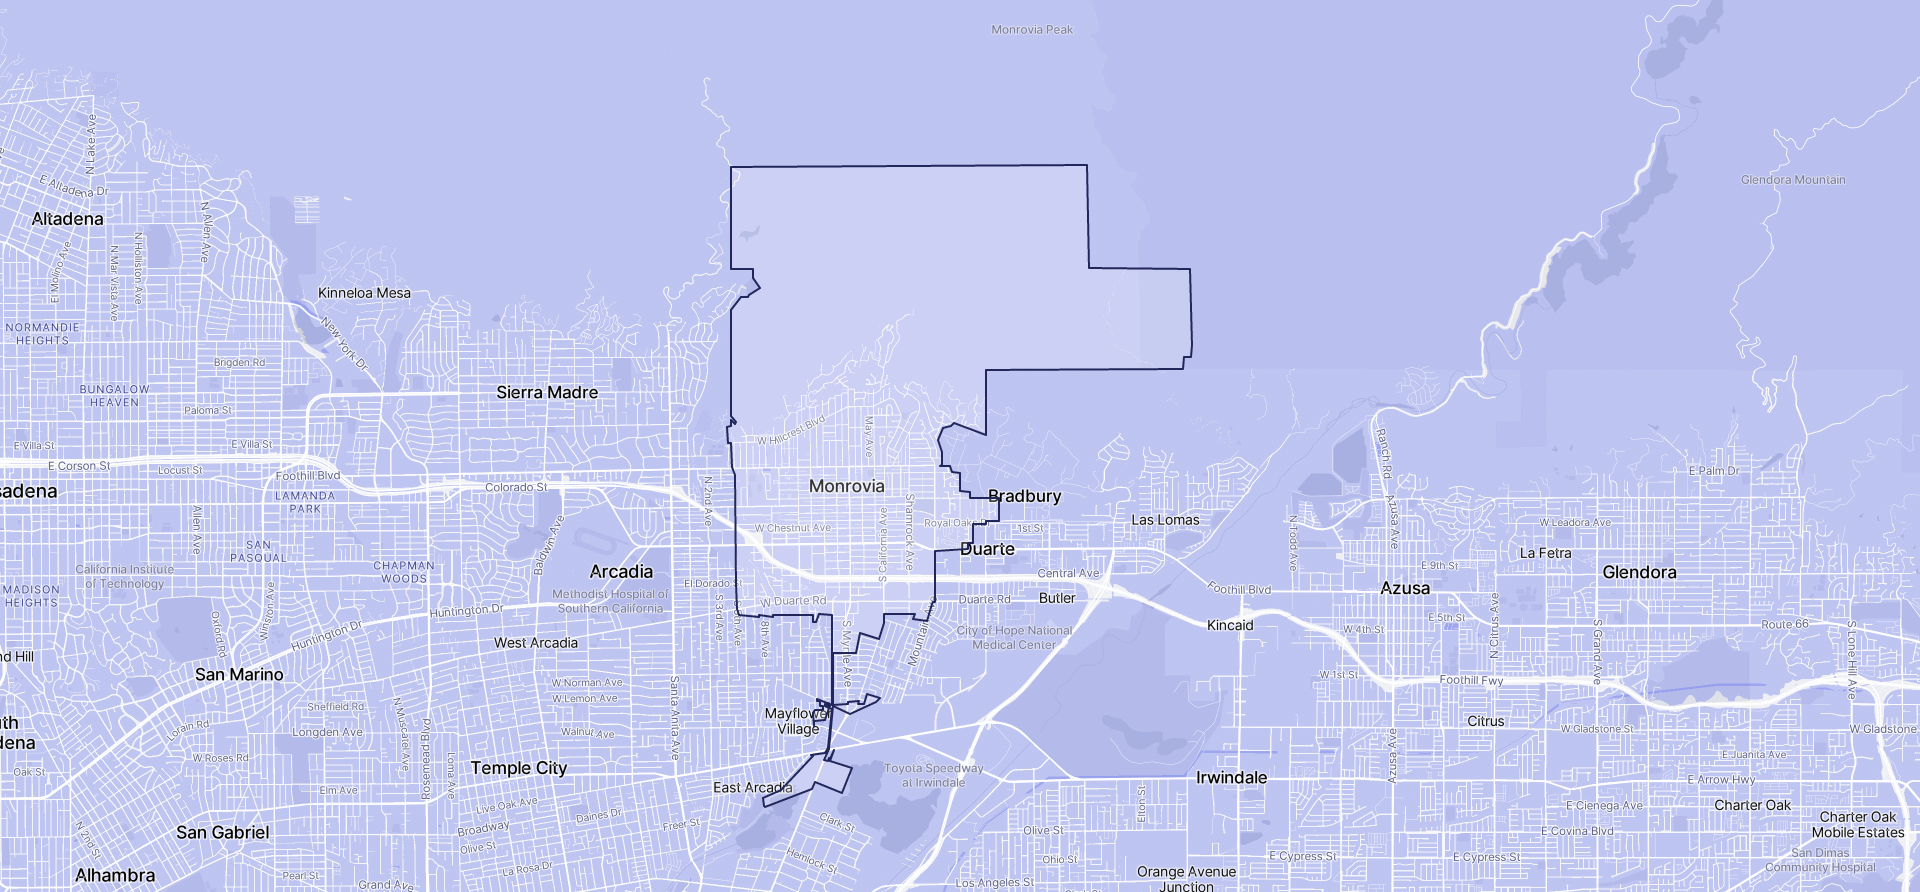 Image of Monrovia boundaries on a map.